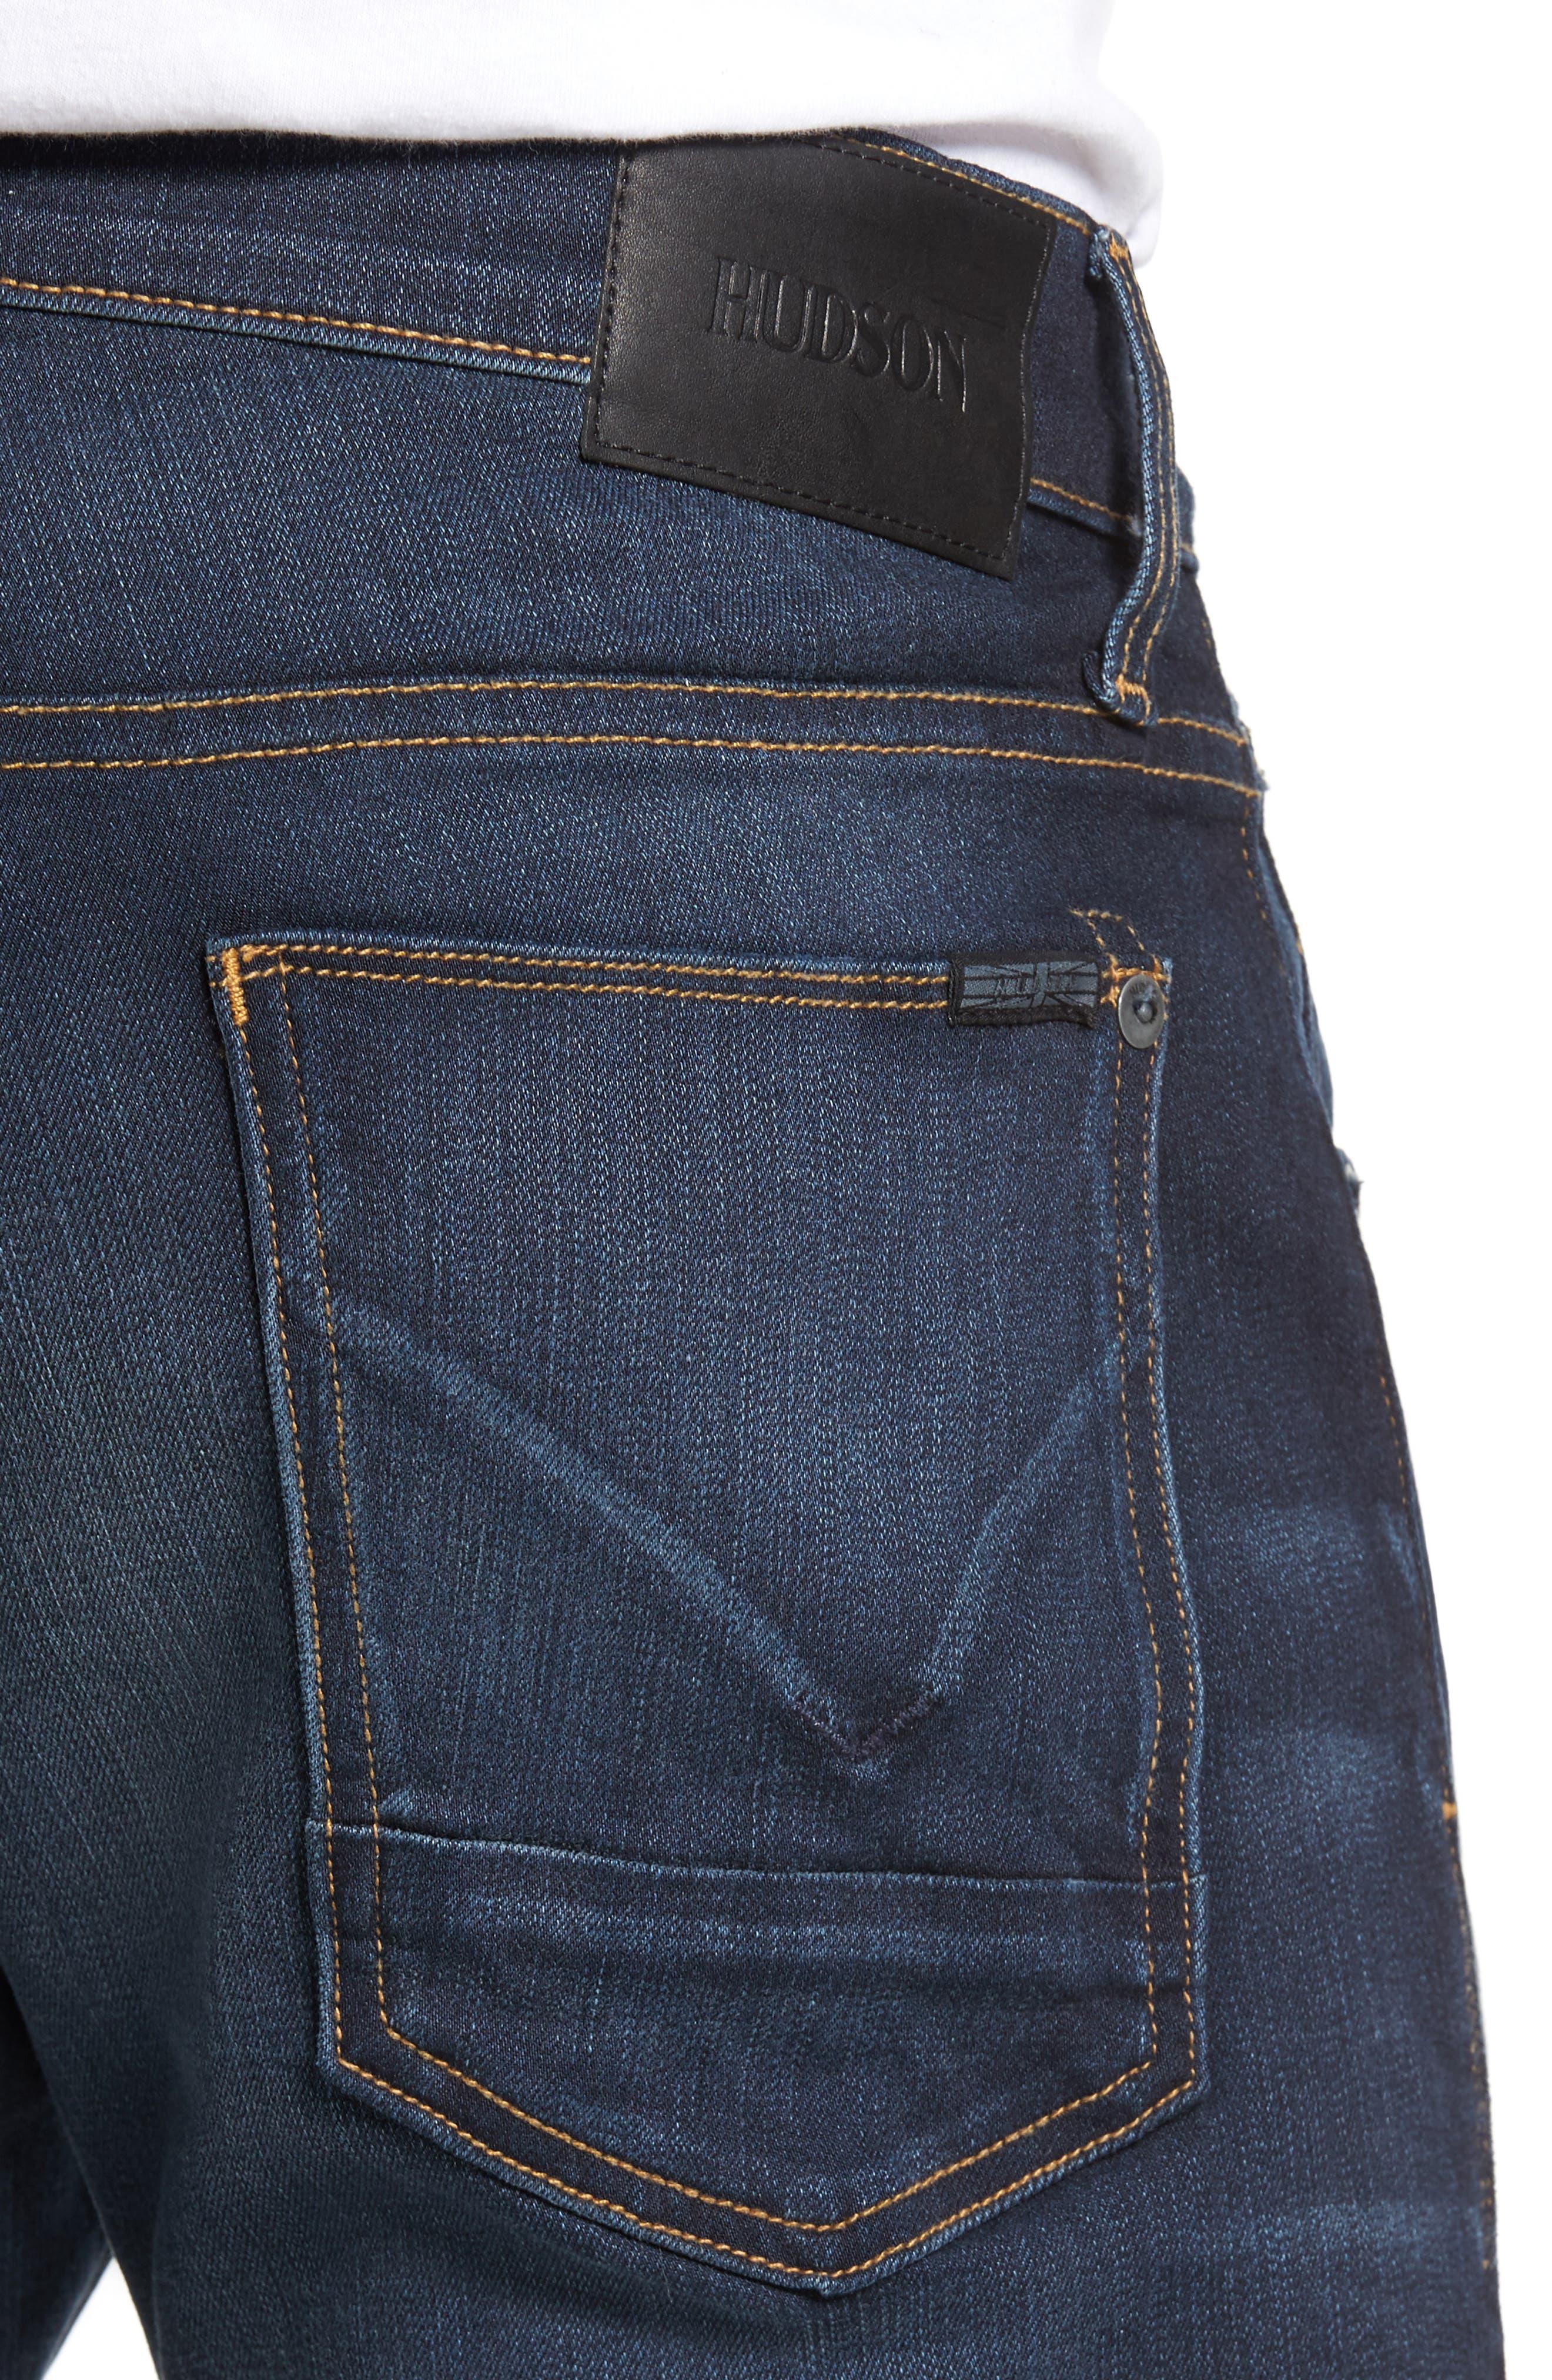 Blake Slim Fit Jeans,                             Alternate thumbnail 12, color,